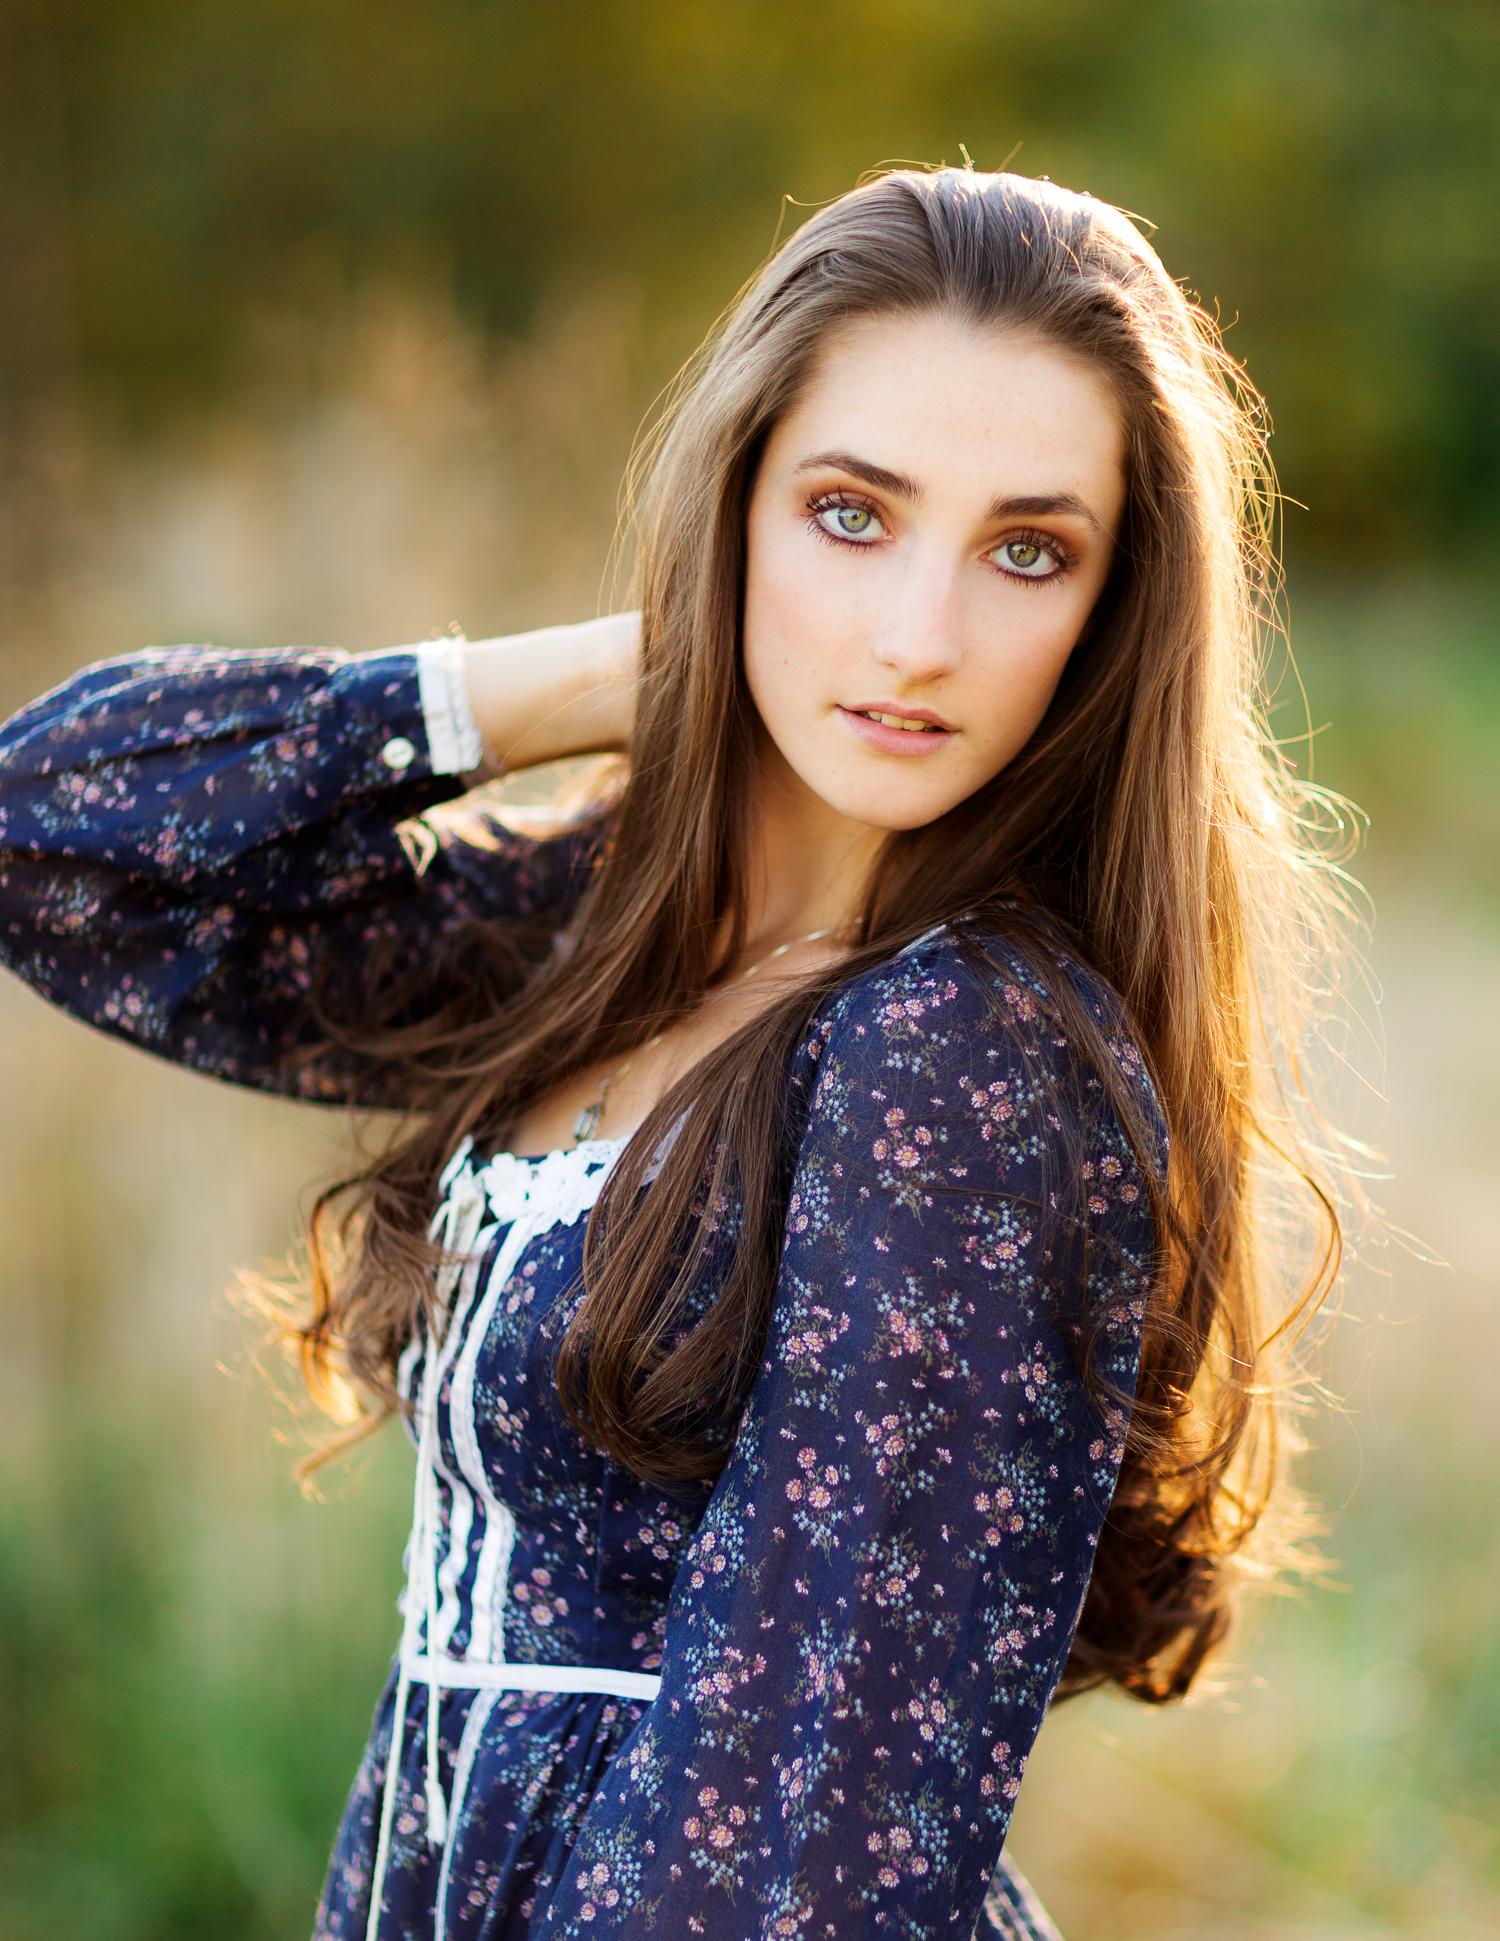 ariellanoellephotography-portraiture-highschool-seniors-top-seattle-area-photographer-1-52.jpg